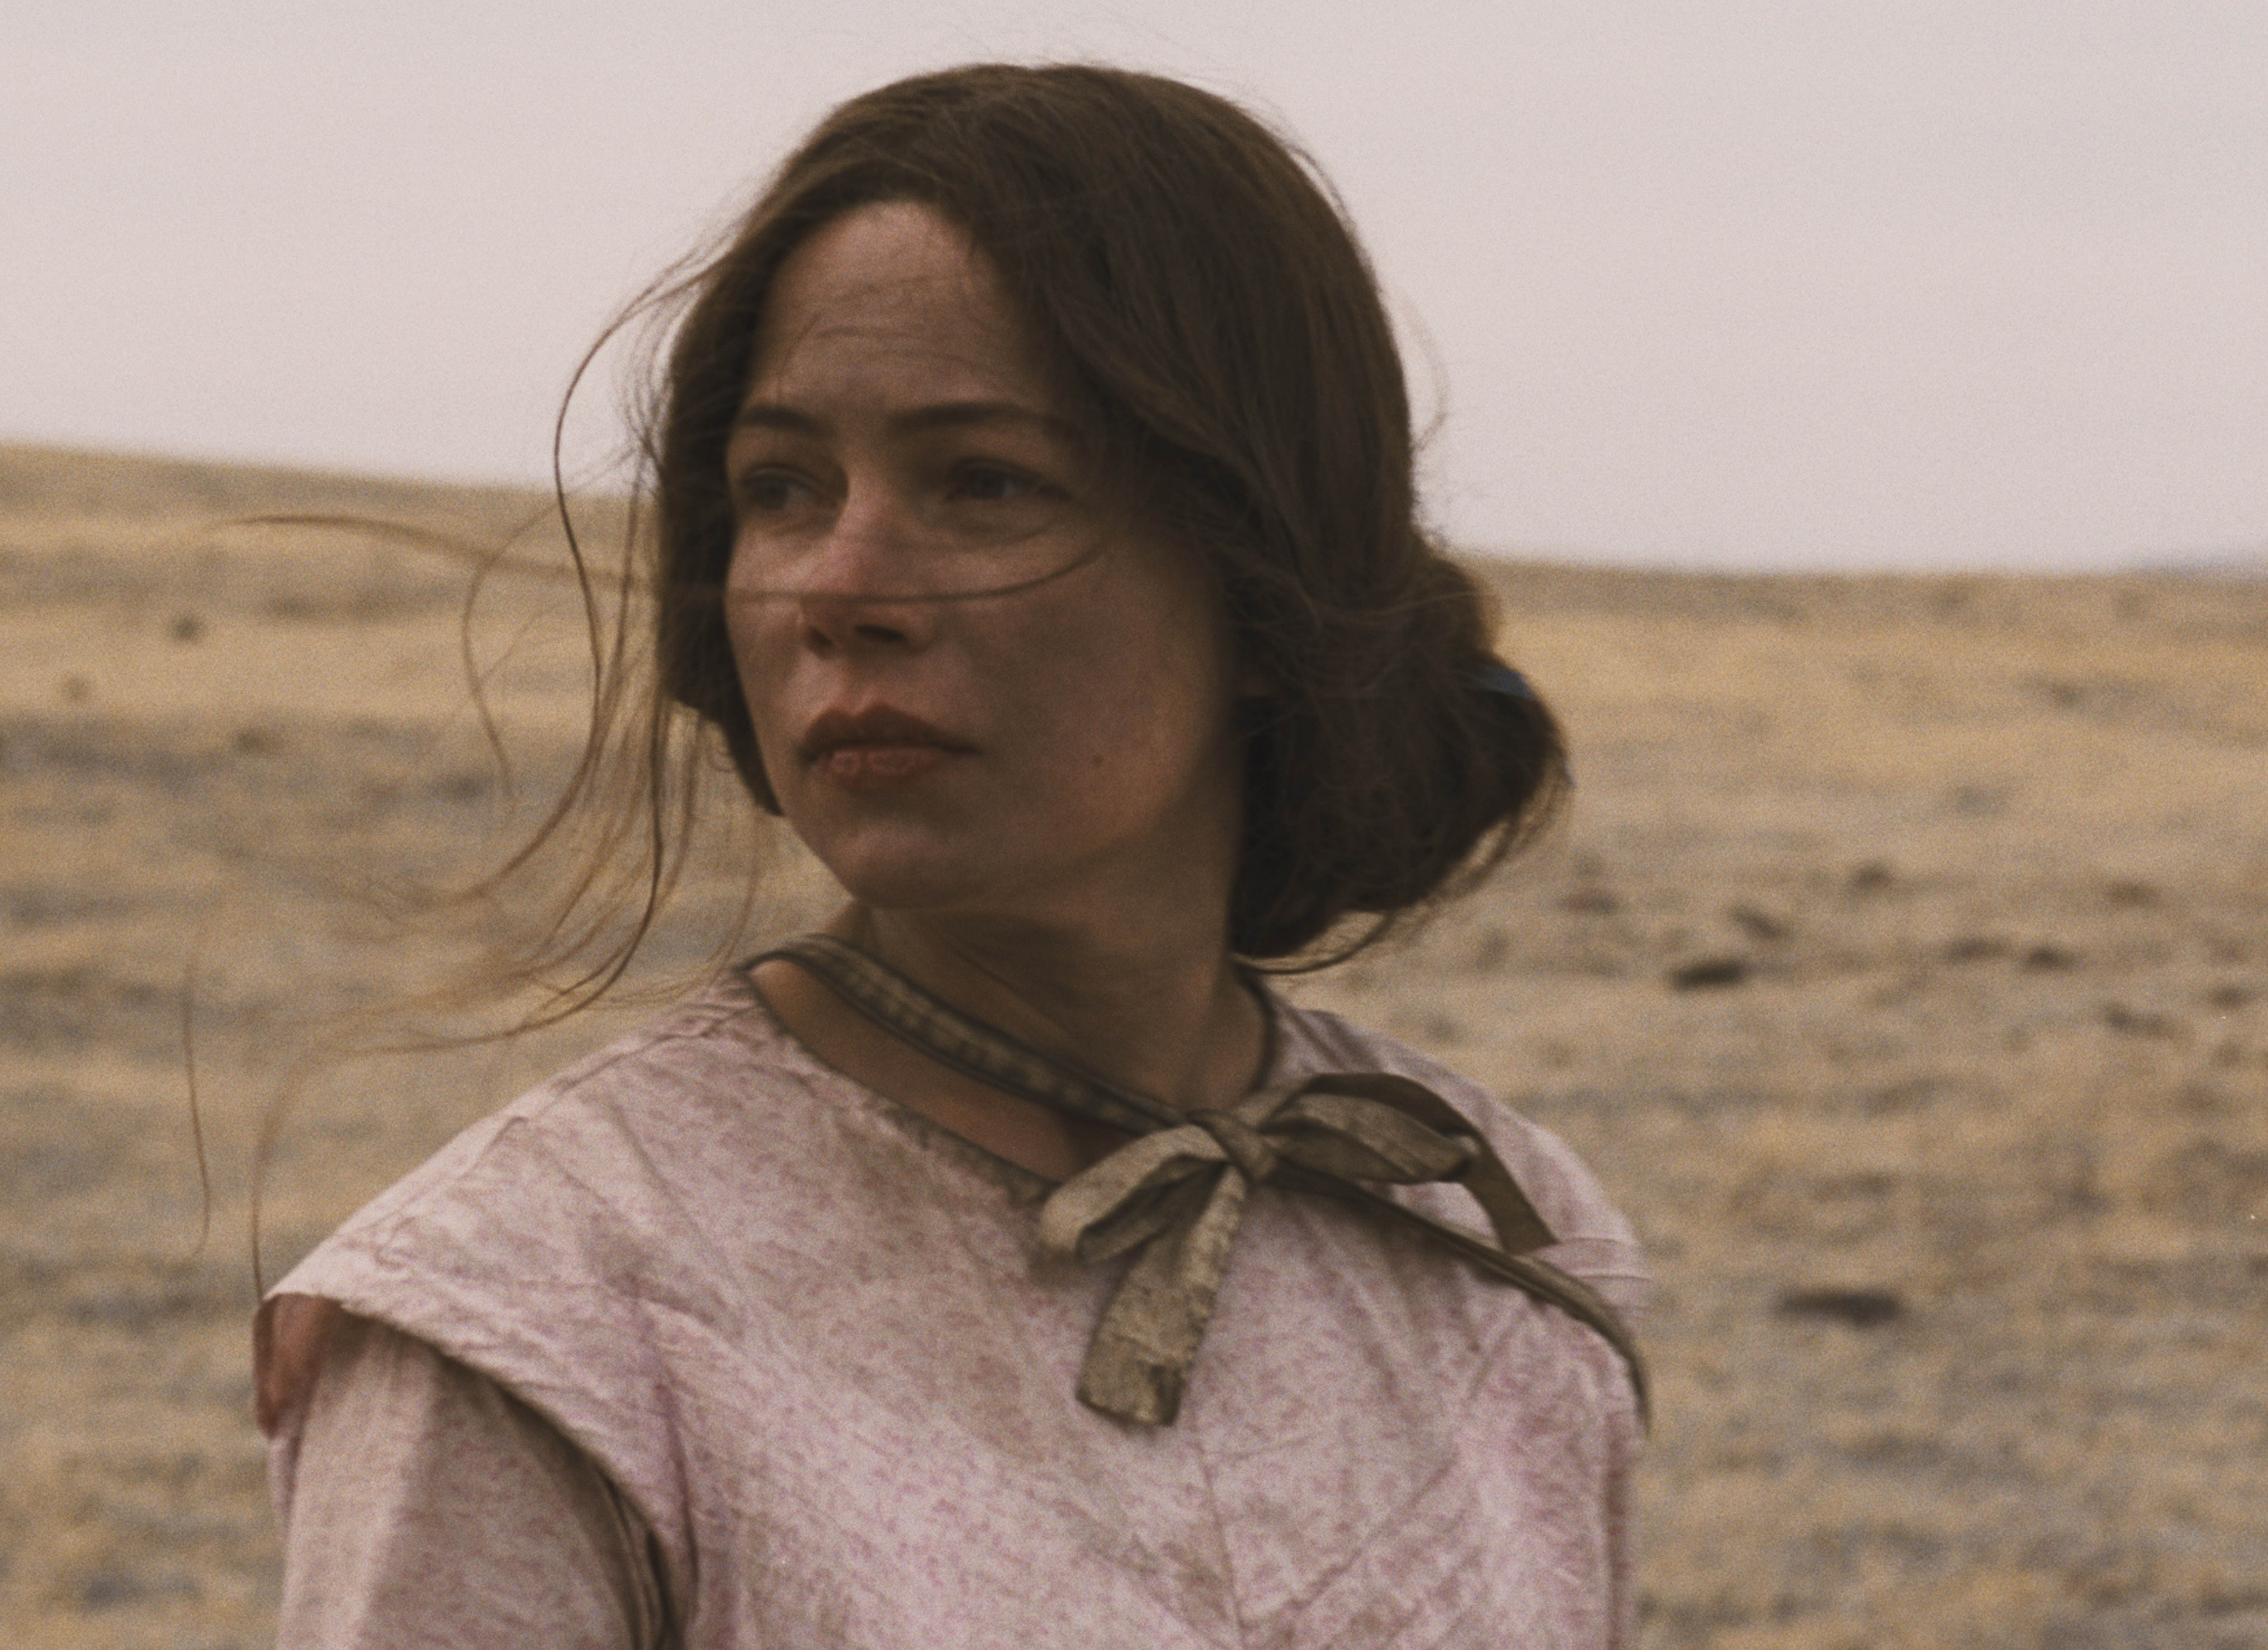 Michelle Williams plays Emily Tetherow in Meek's Cutoff